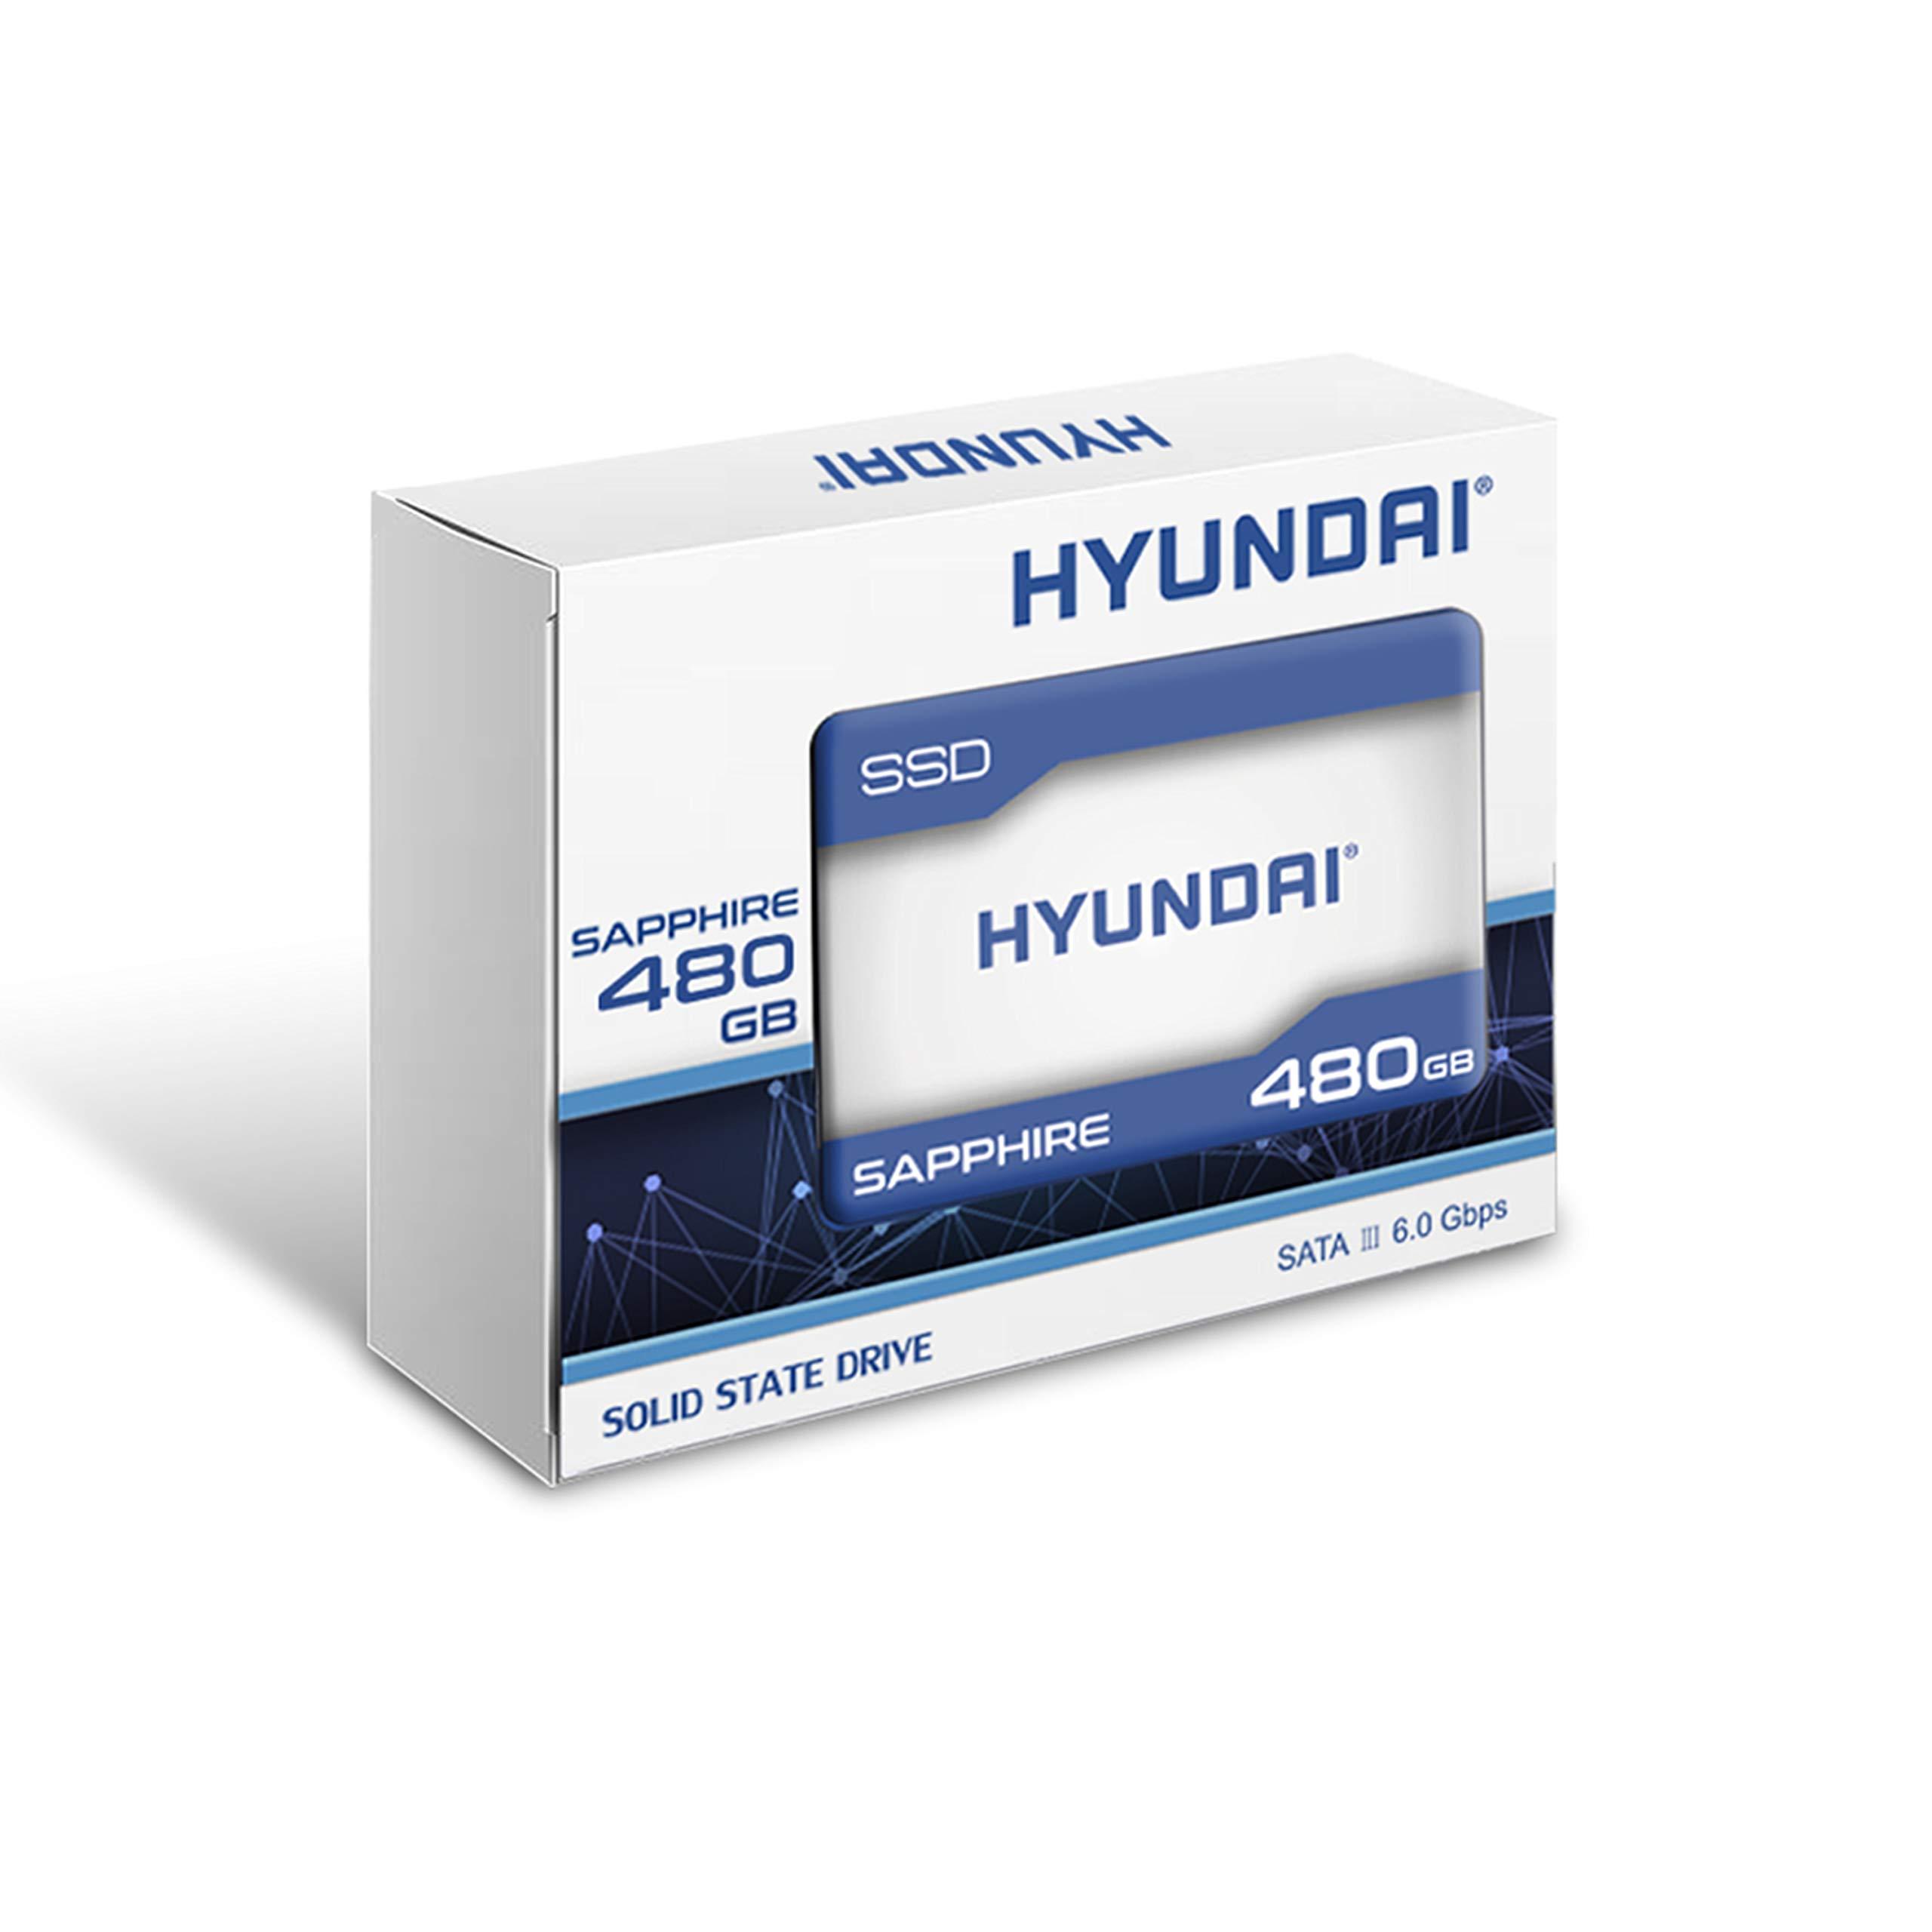 Hyundai Sapphire 480GB Internal SSD SATA III, TLC, 2.5'' (C2S3T/480G)